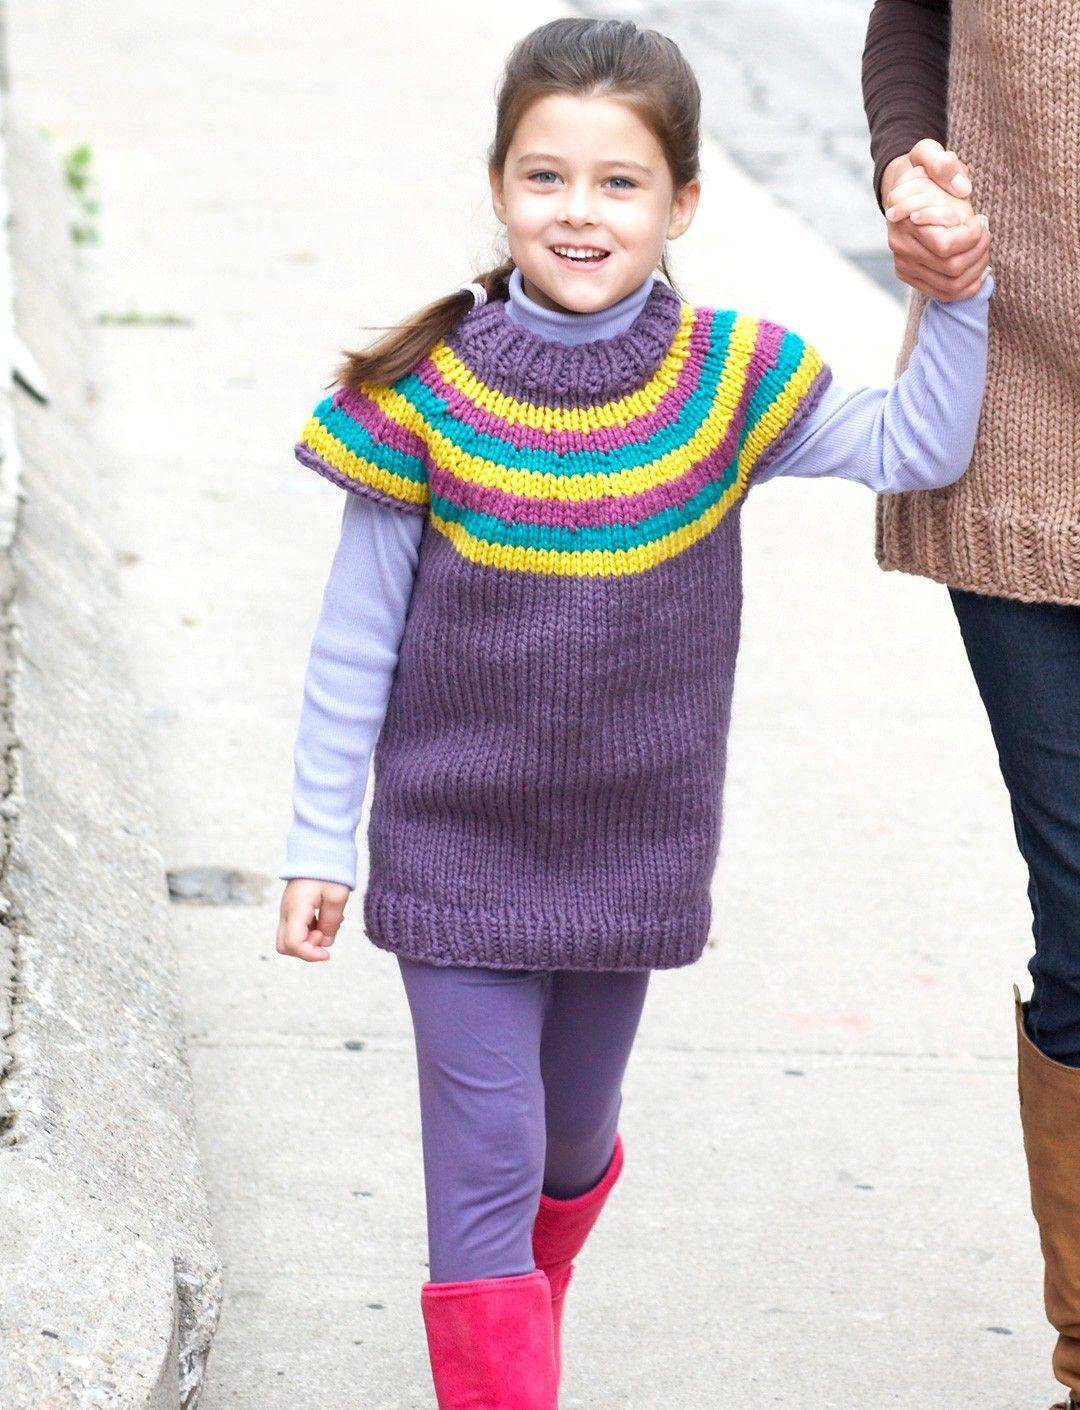 Yarnspirations bernat striped yoke pullover patterns patons kids top down striped sweater knit pattern bankloansurffo Image collections